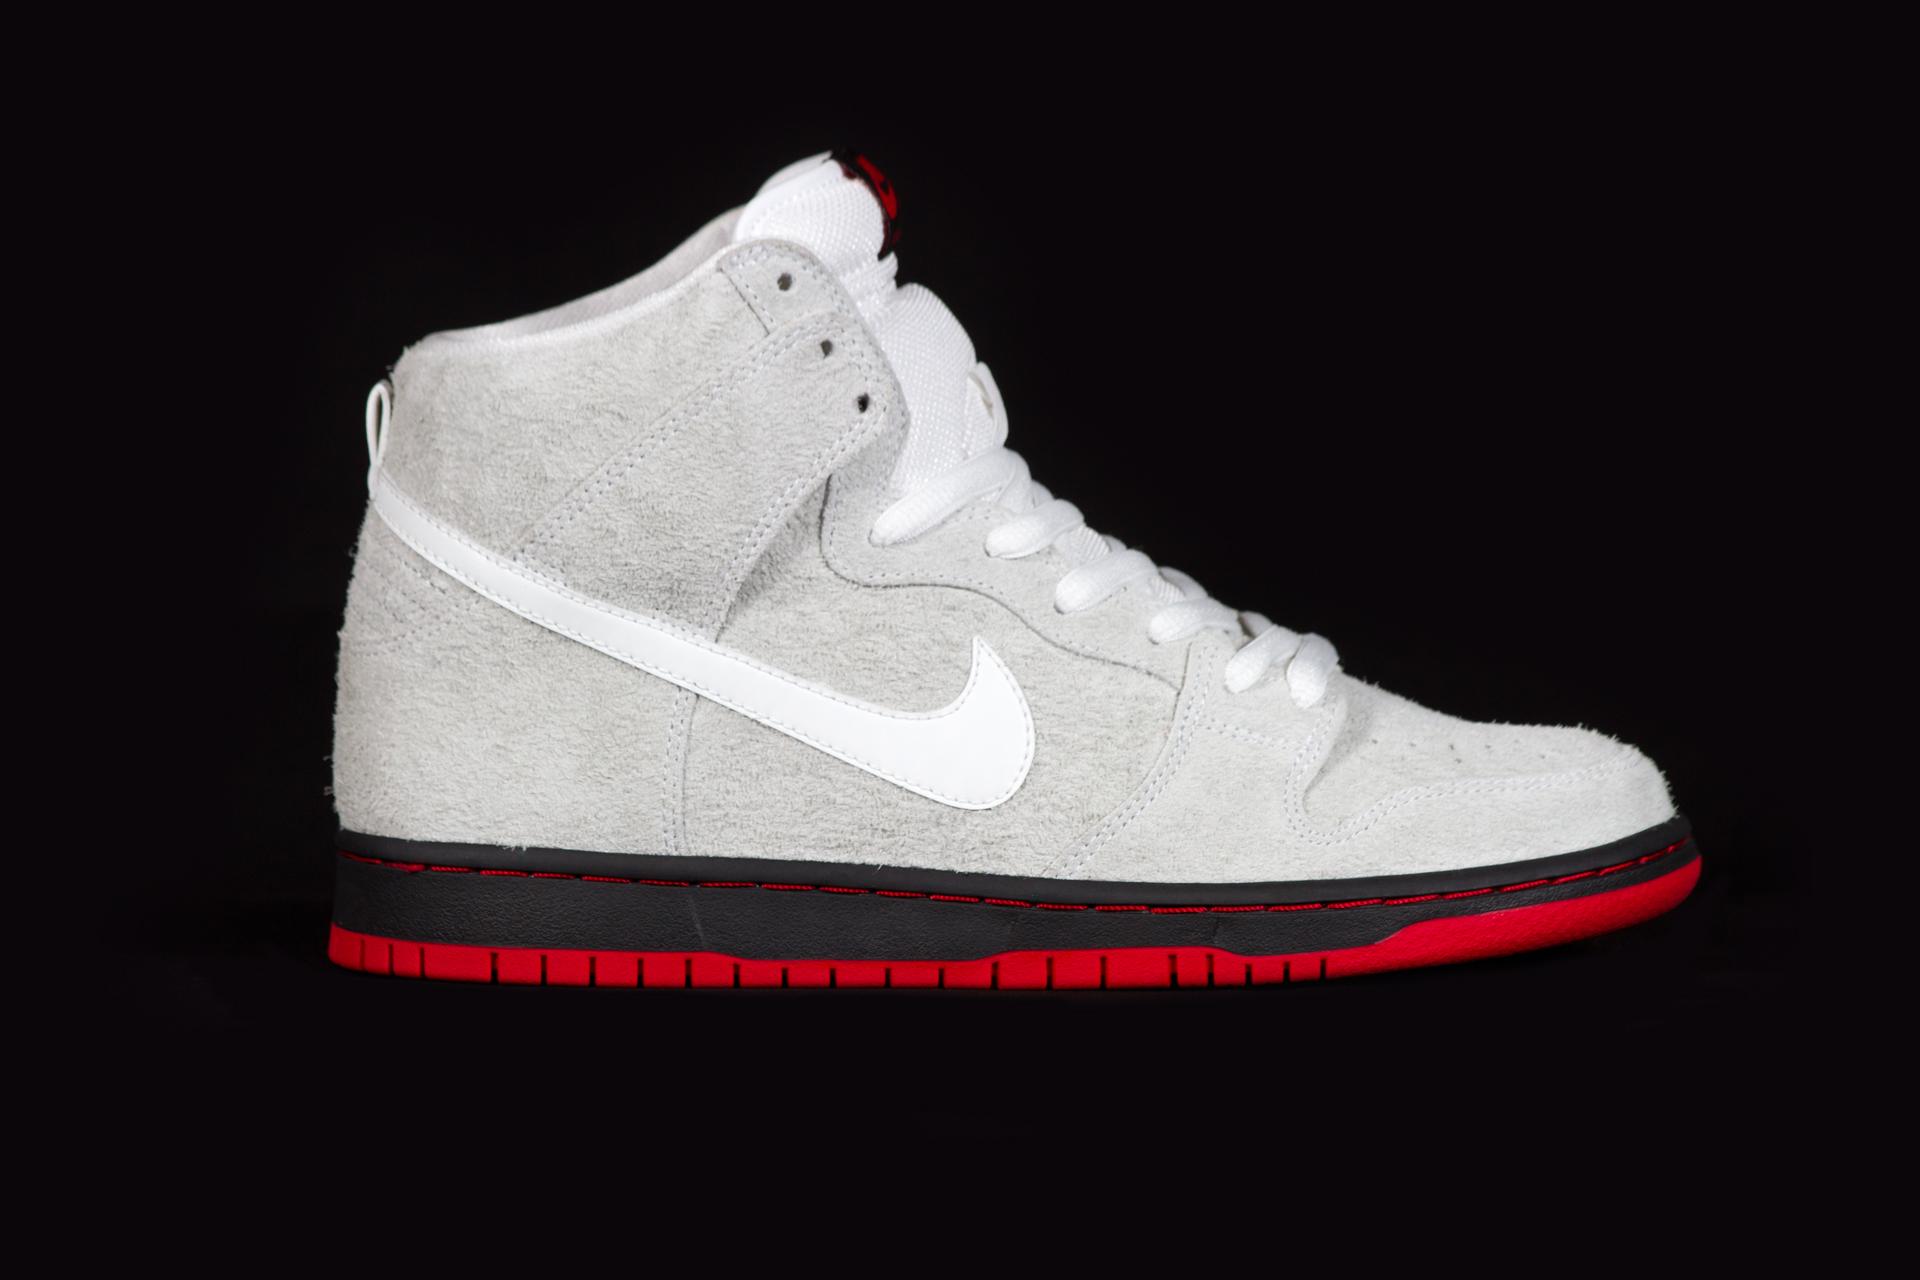 NikeSB_DunkHi_BlackSheep_Profile